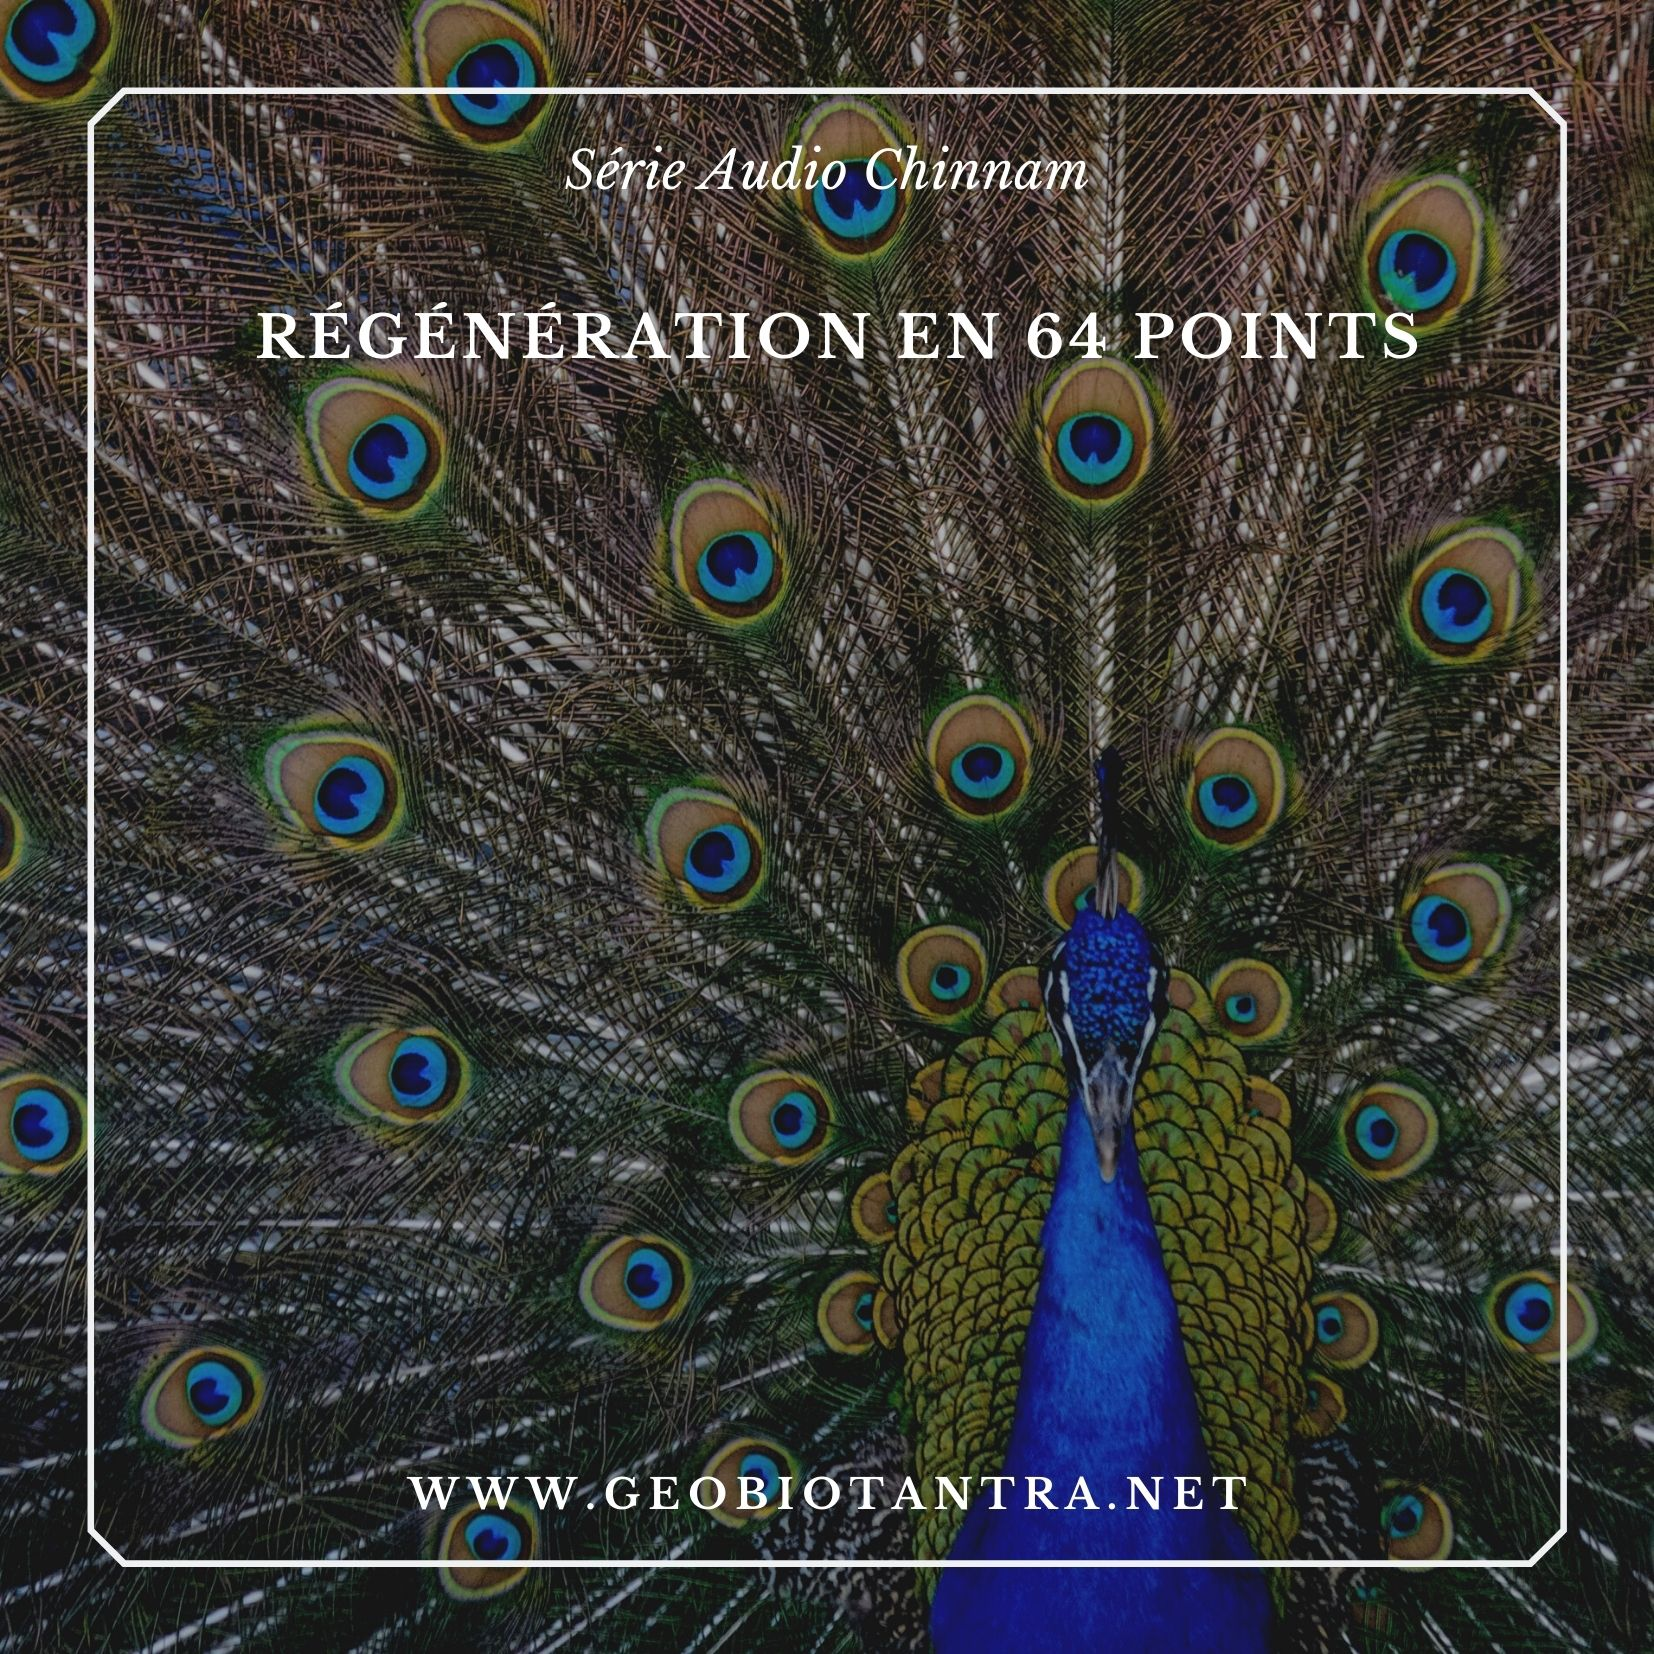 geobiotantra-boutique-serie-audio-meditation-guidee-regeneration-en-64-points